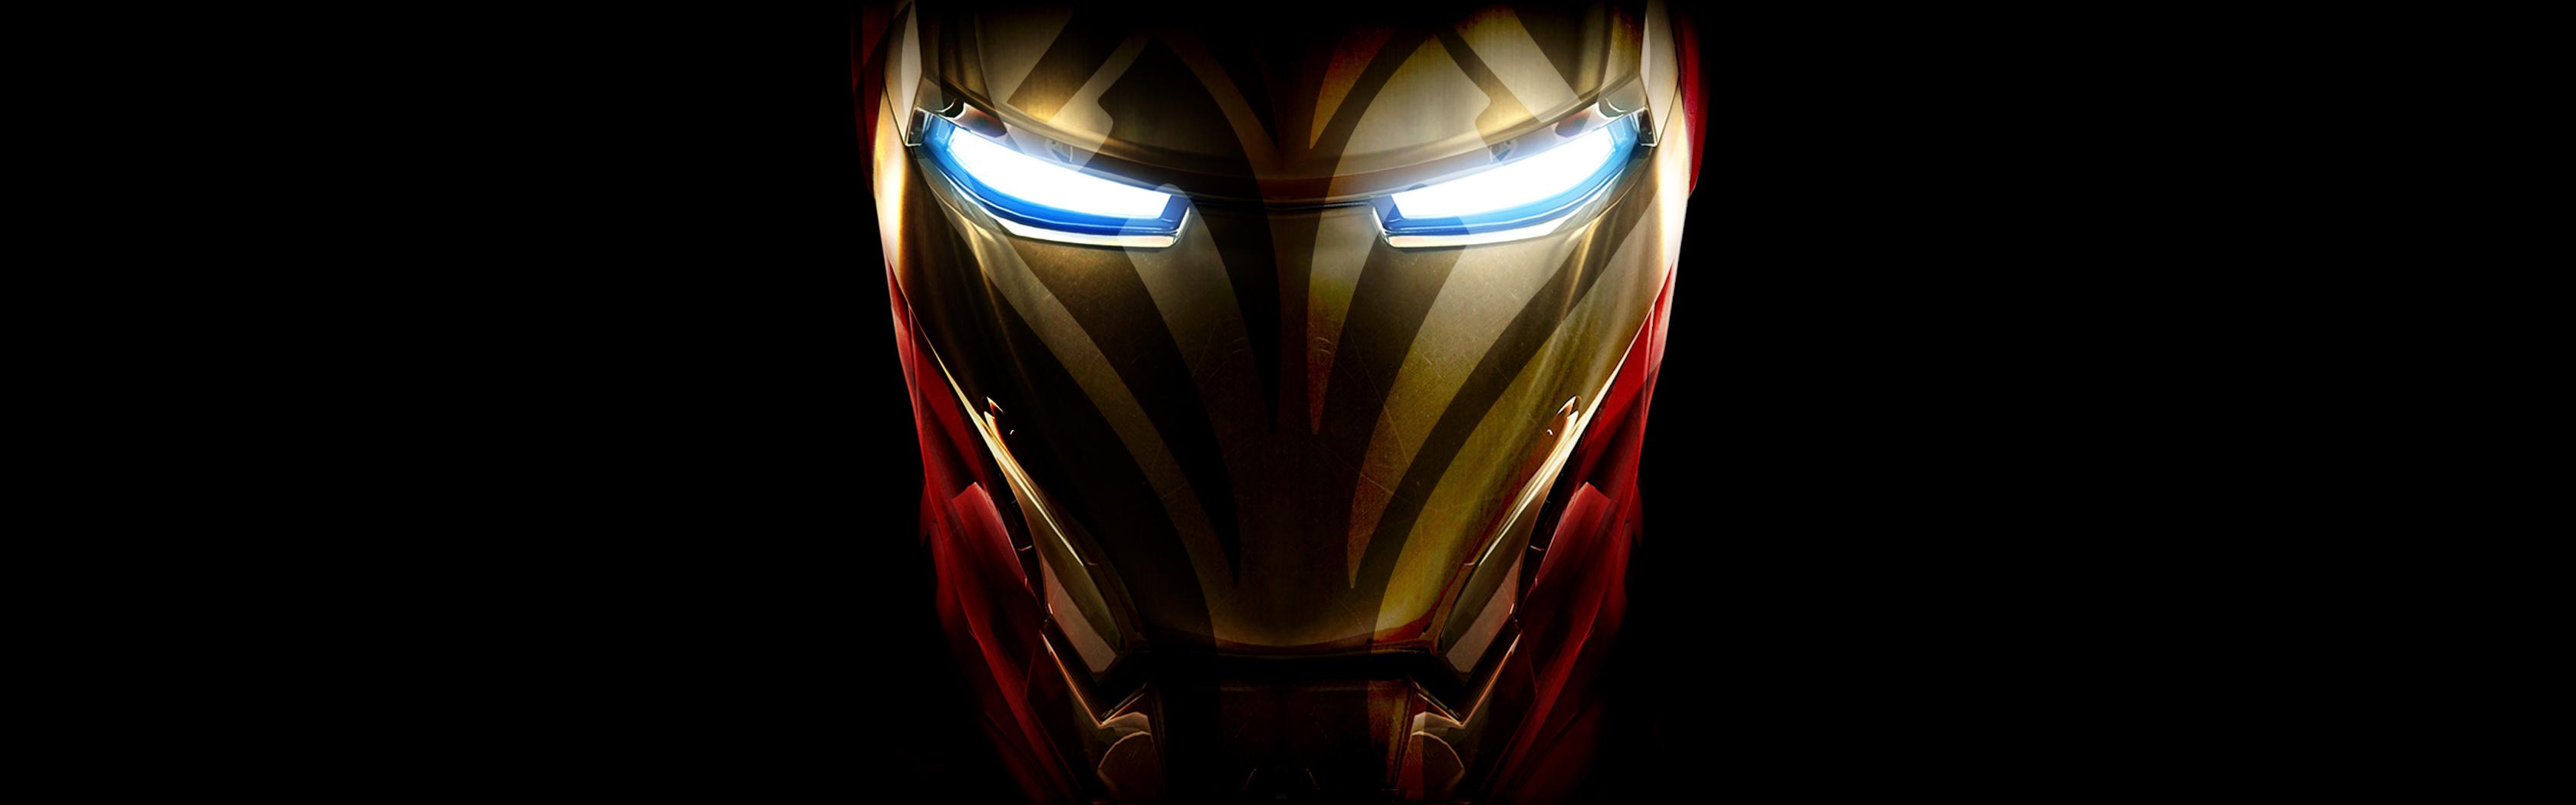 Wallpapers HD Iron Man - WallpaperSafari